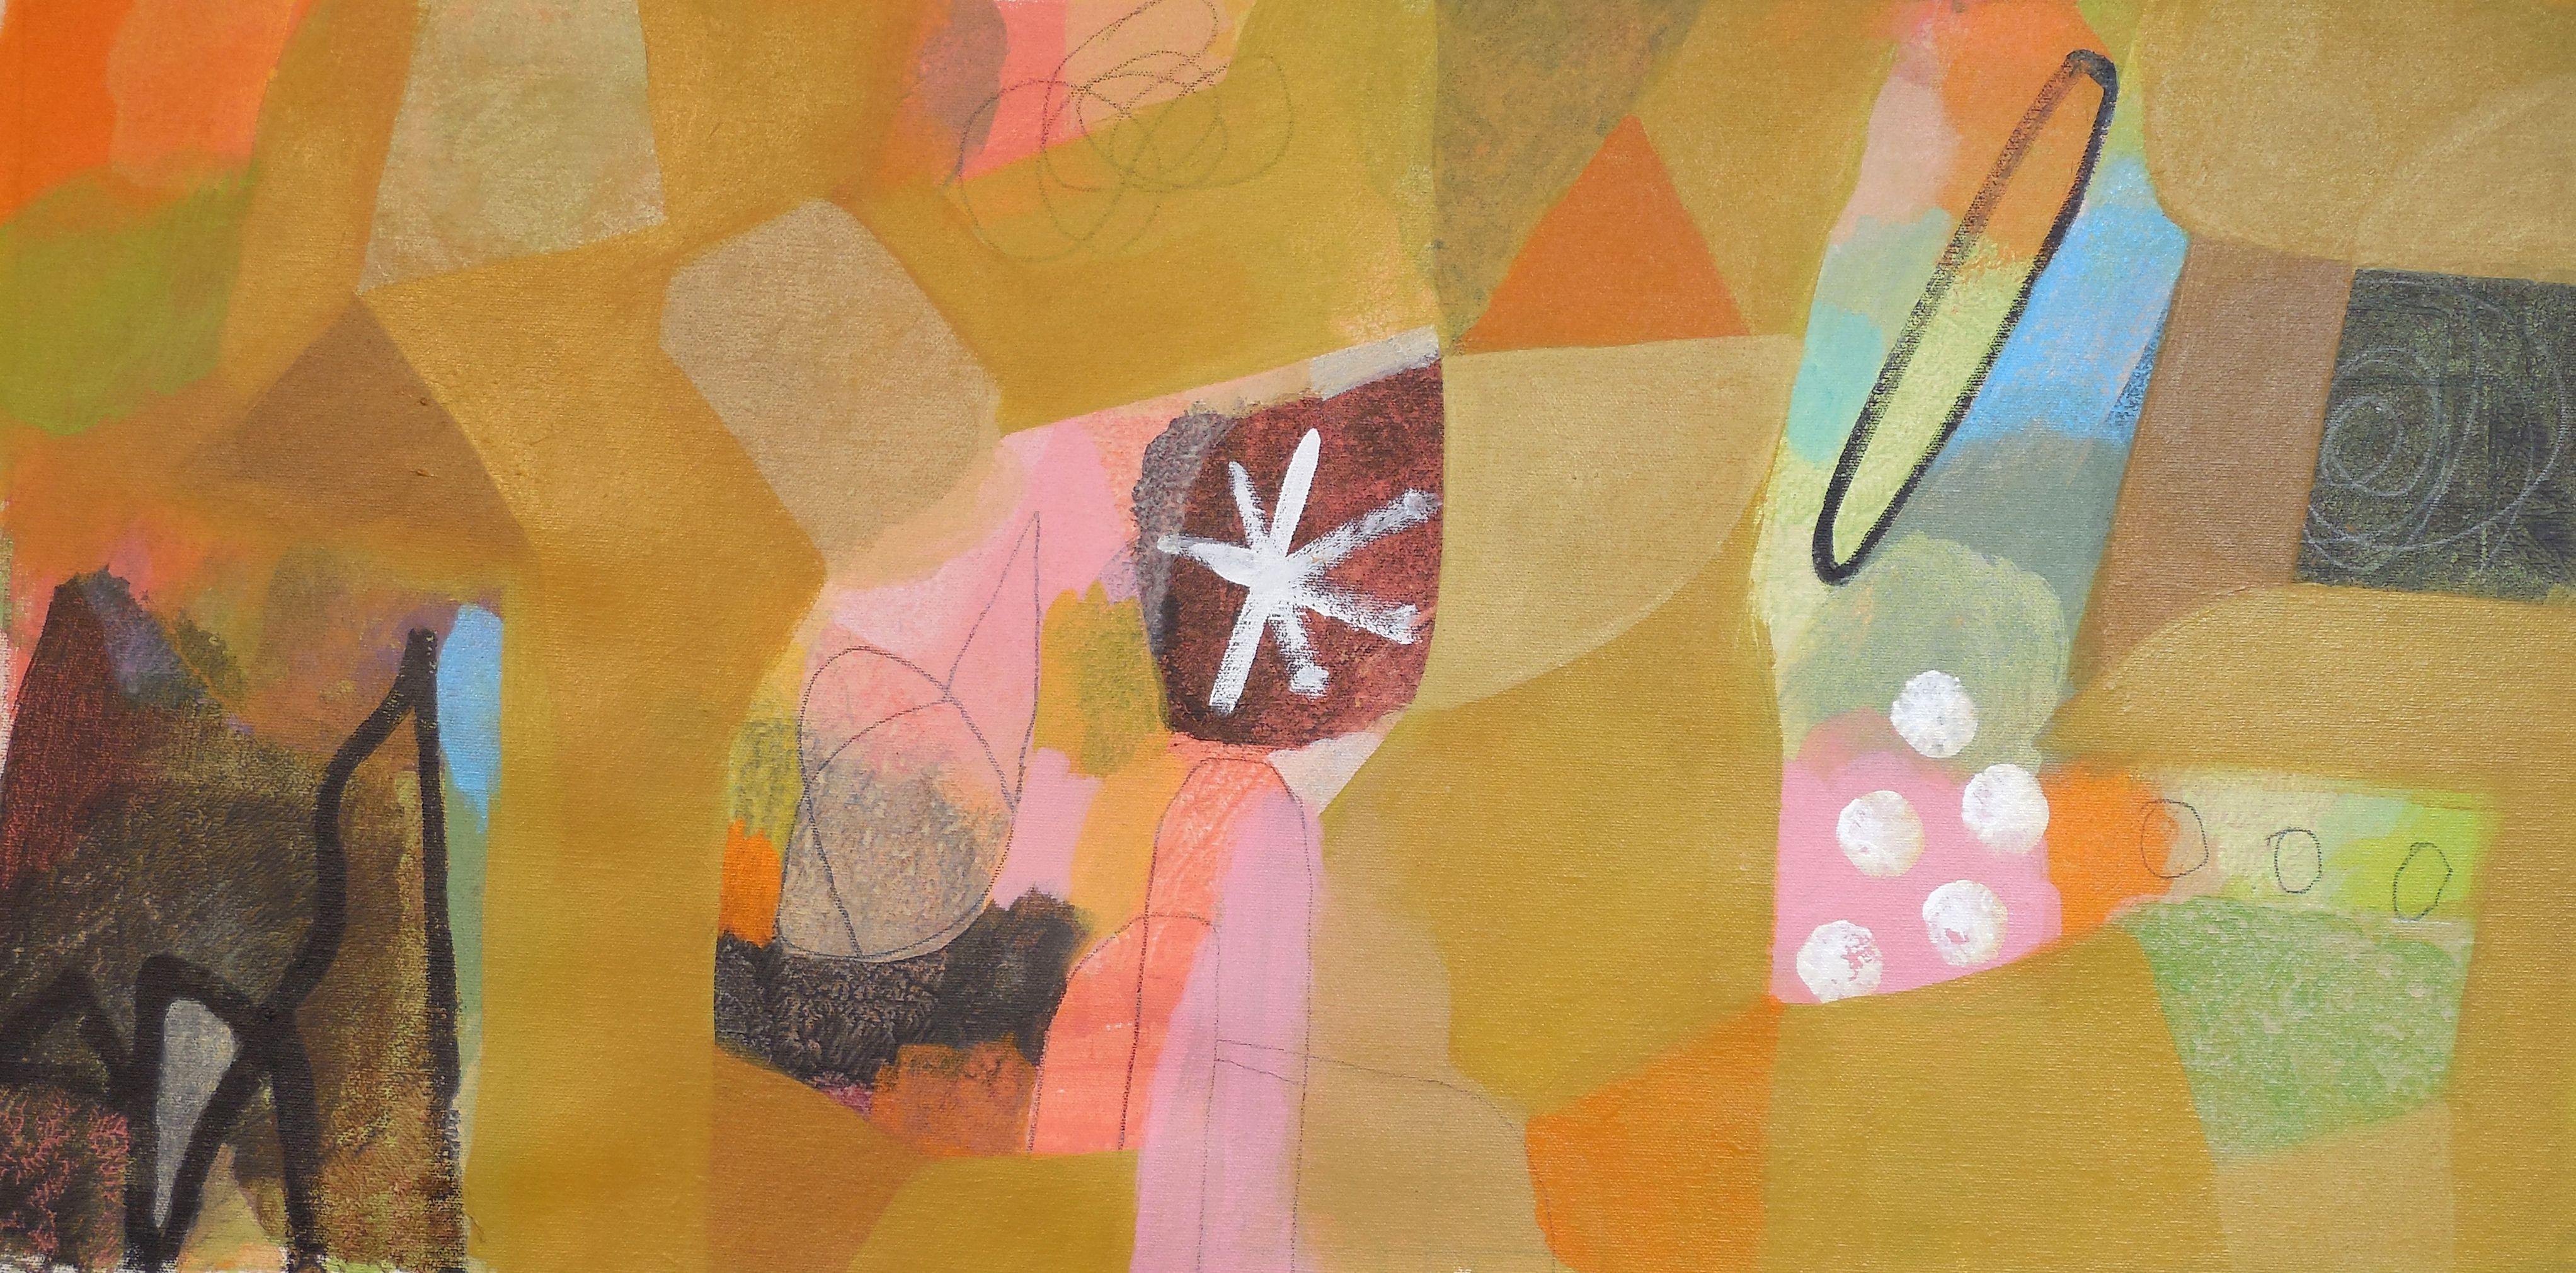 Northstar, Painting, Acrylic on Canvas